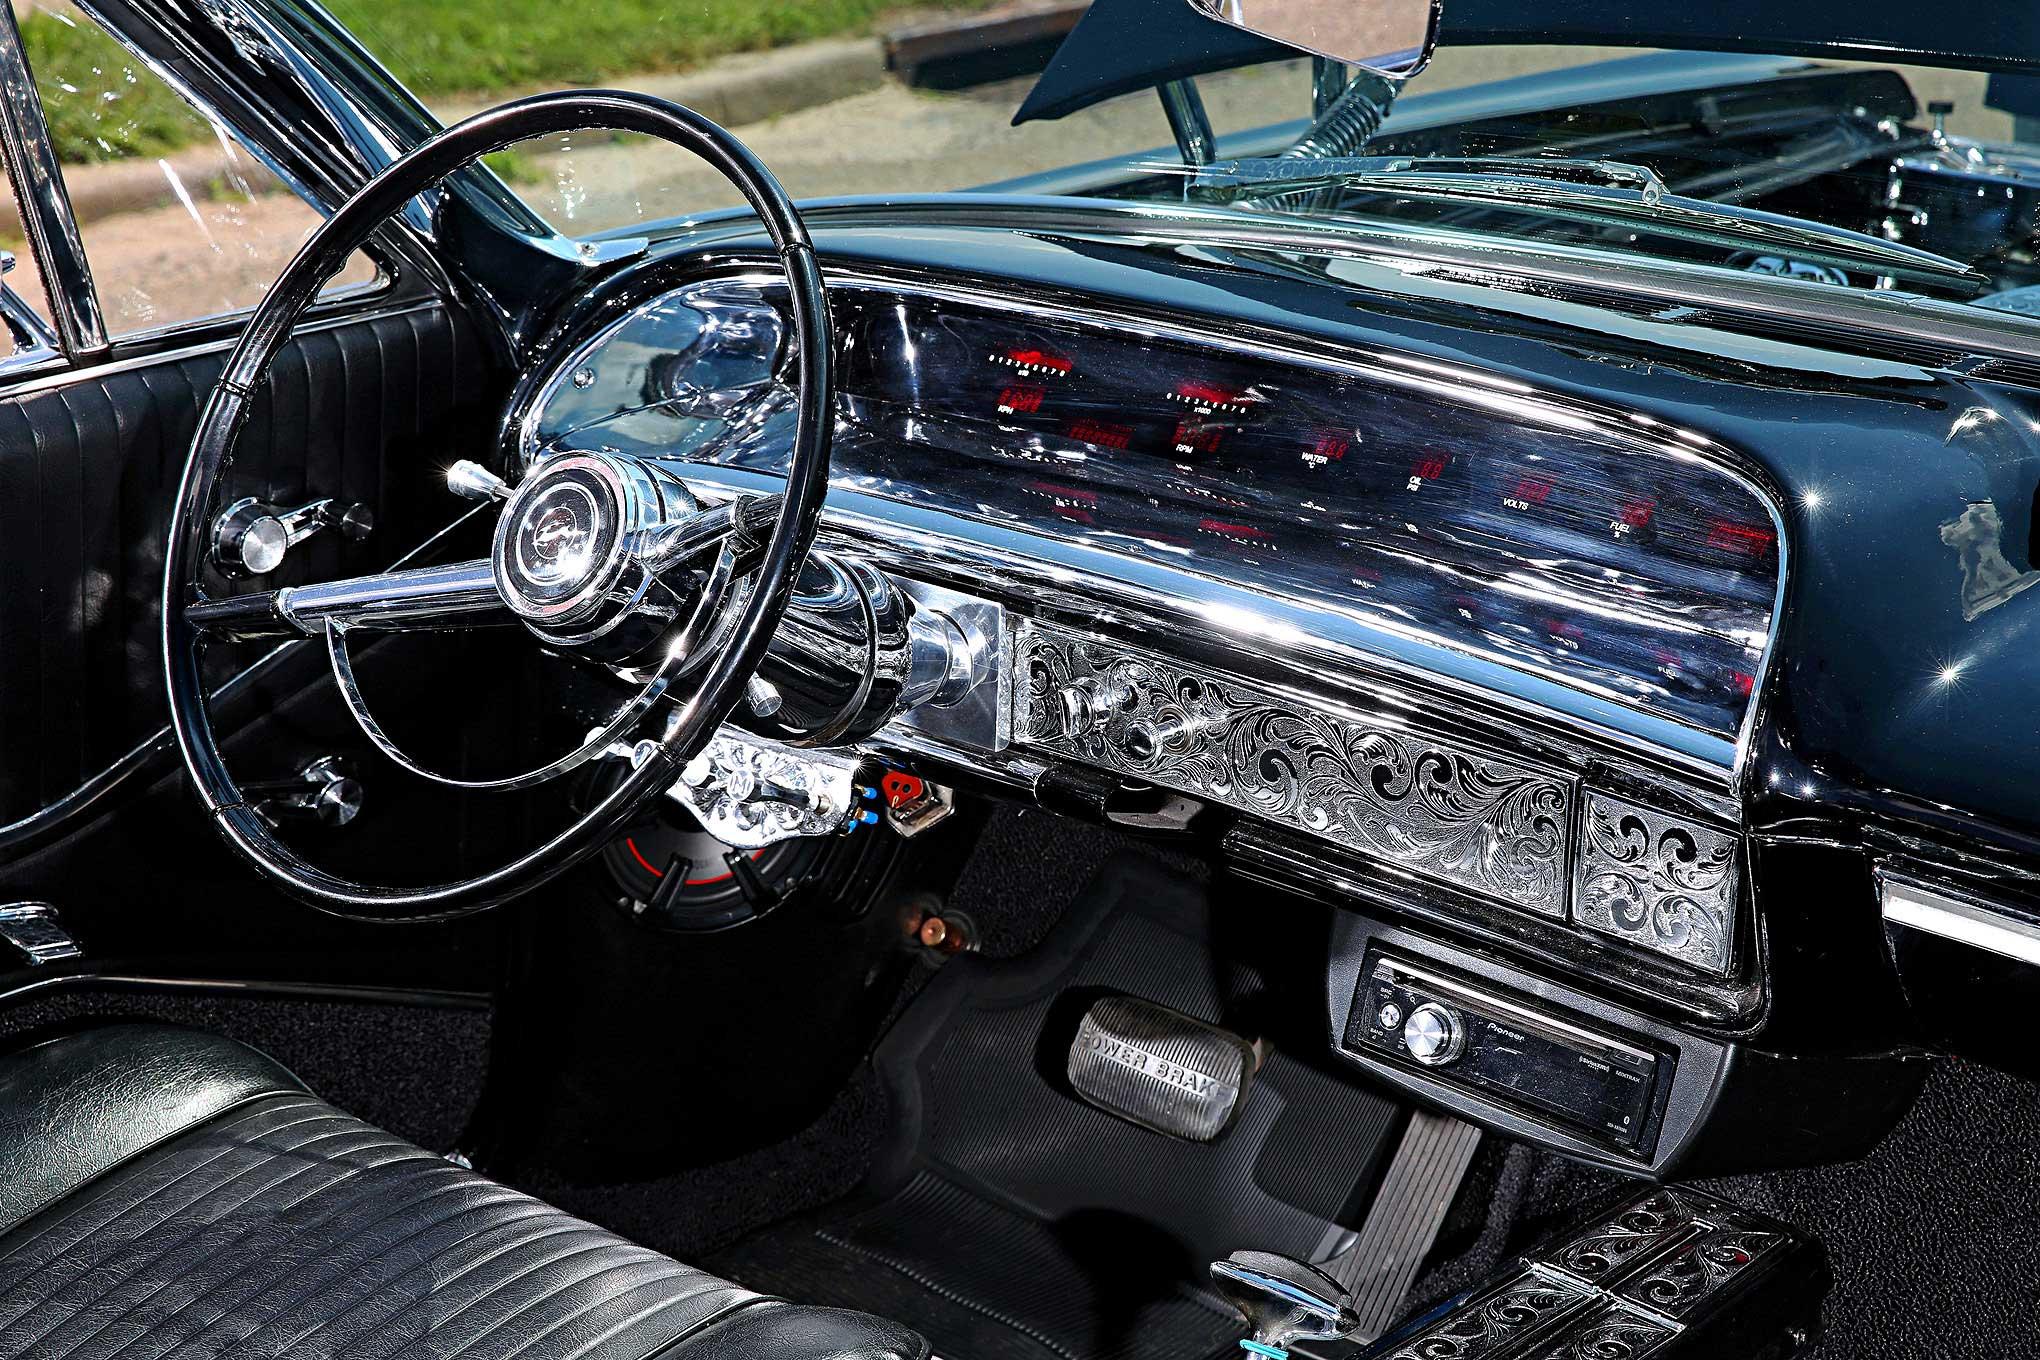 A  U0026 39 64 Impala Rag That Brings Heat To The East Coast